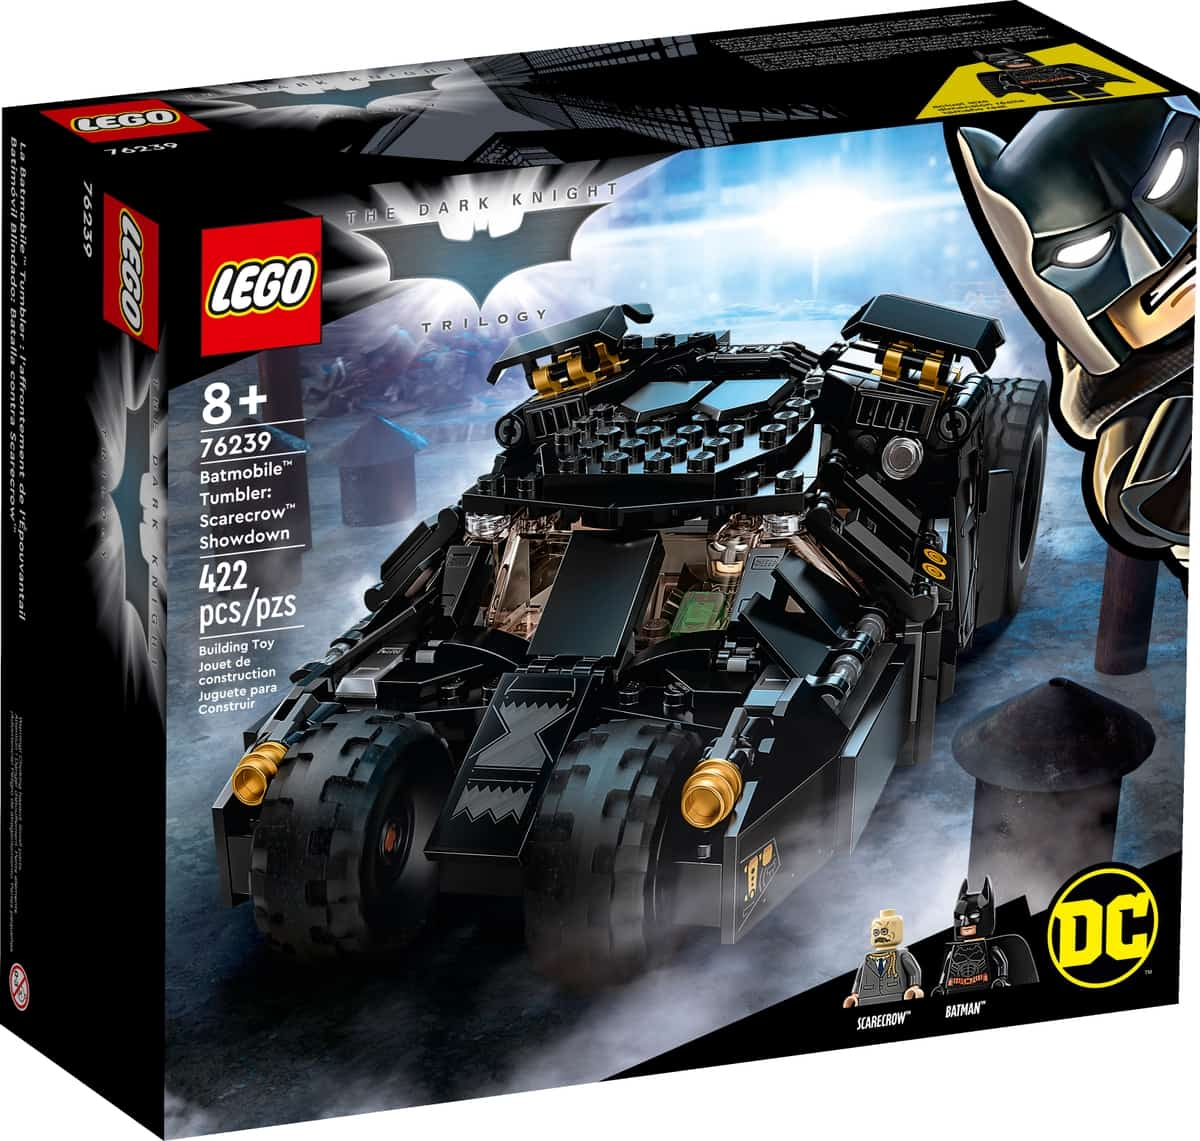 lego 76239 dc batman batmobile tumbler duell mit scarecrow